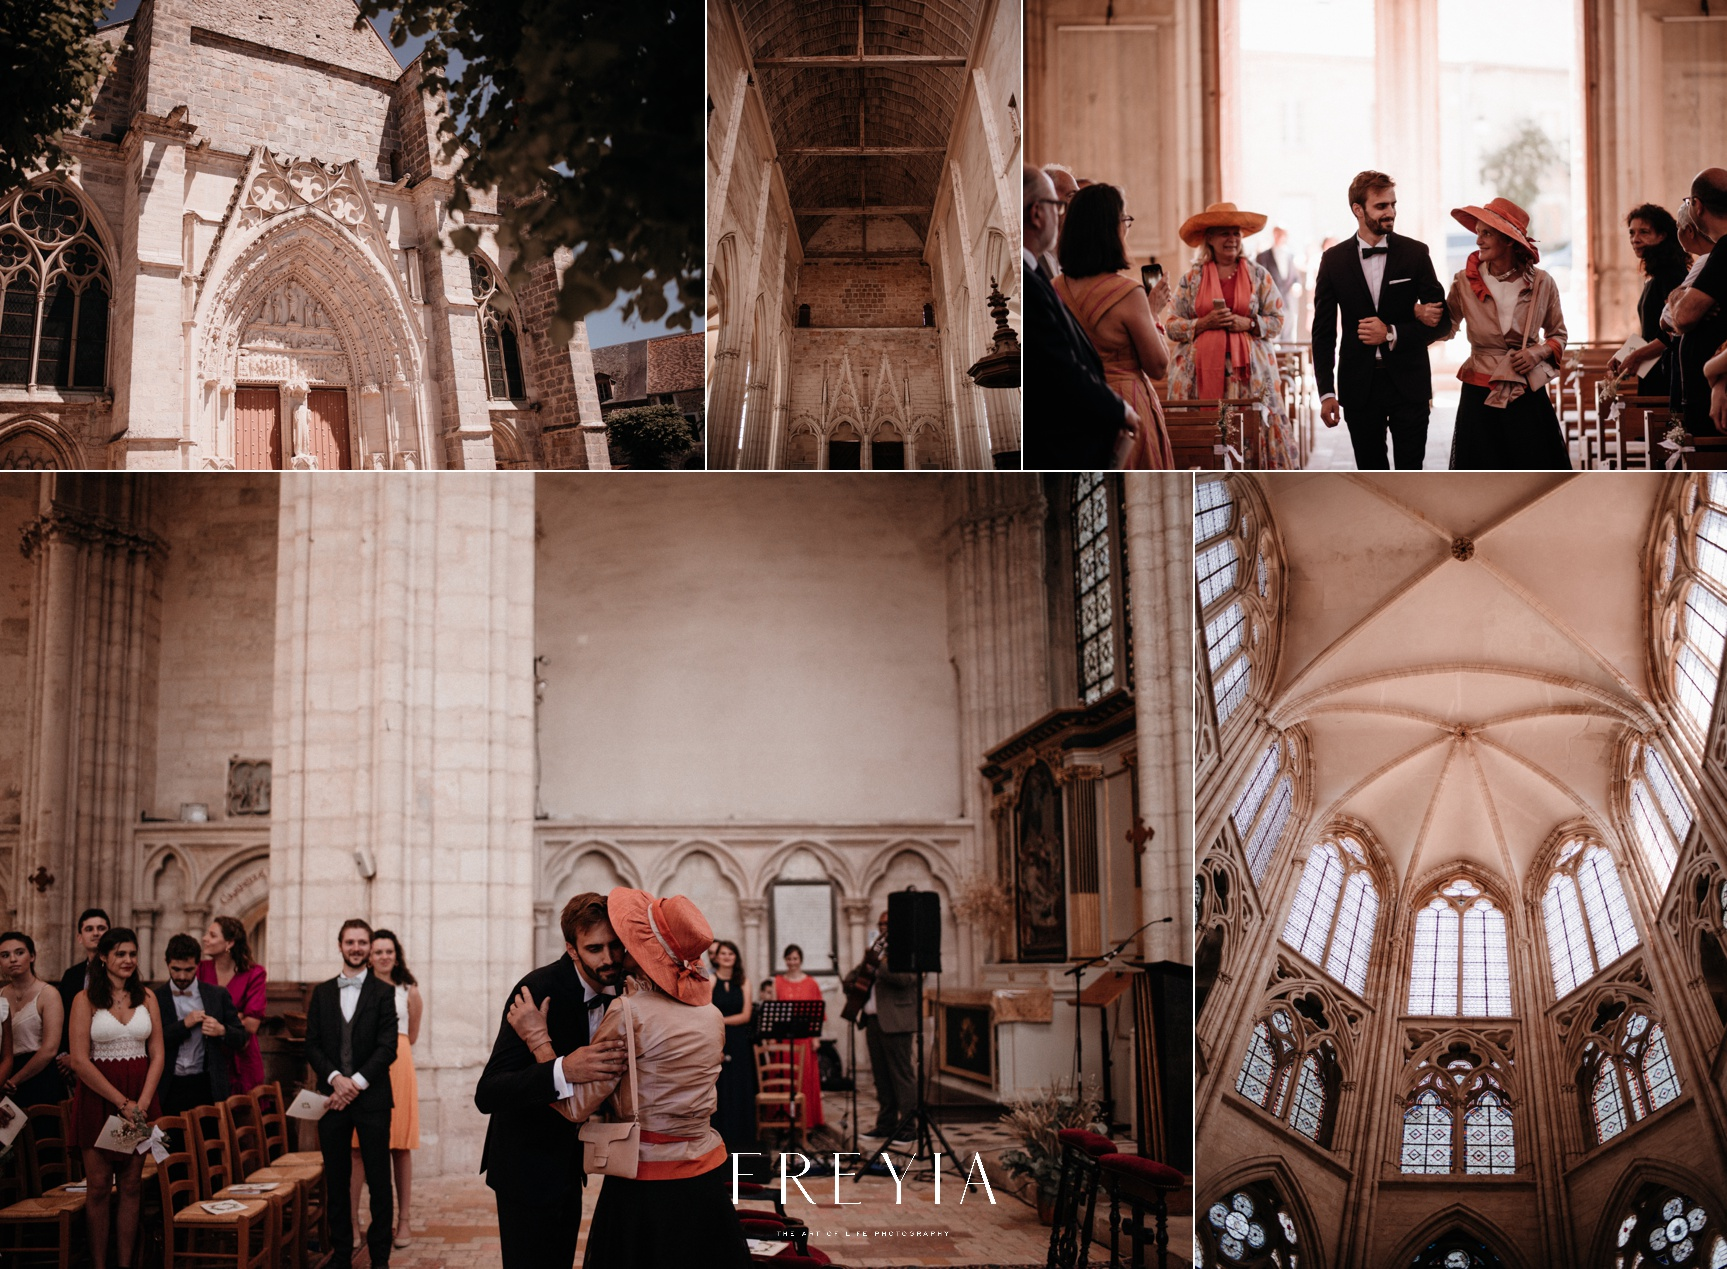 R + T |  mariage reportage alternatif moody intime minimaliste vintage naturel boho boheme |  PHOTOGRAPHE mariage PARIS france destination  | FREYIA photography_-130.jpg